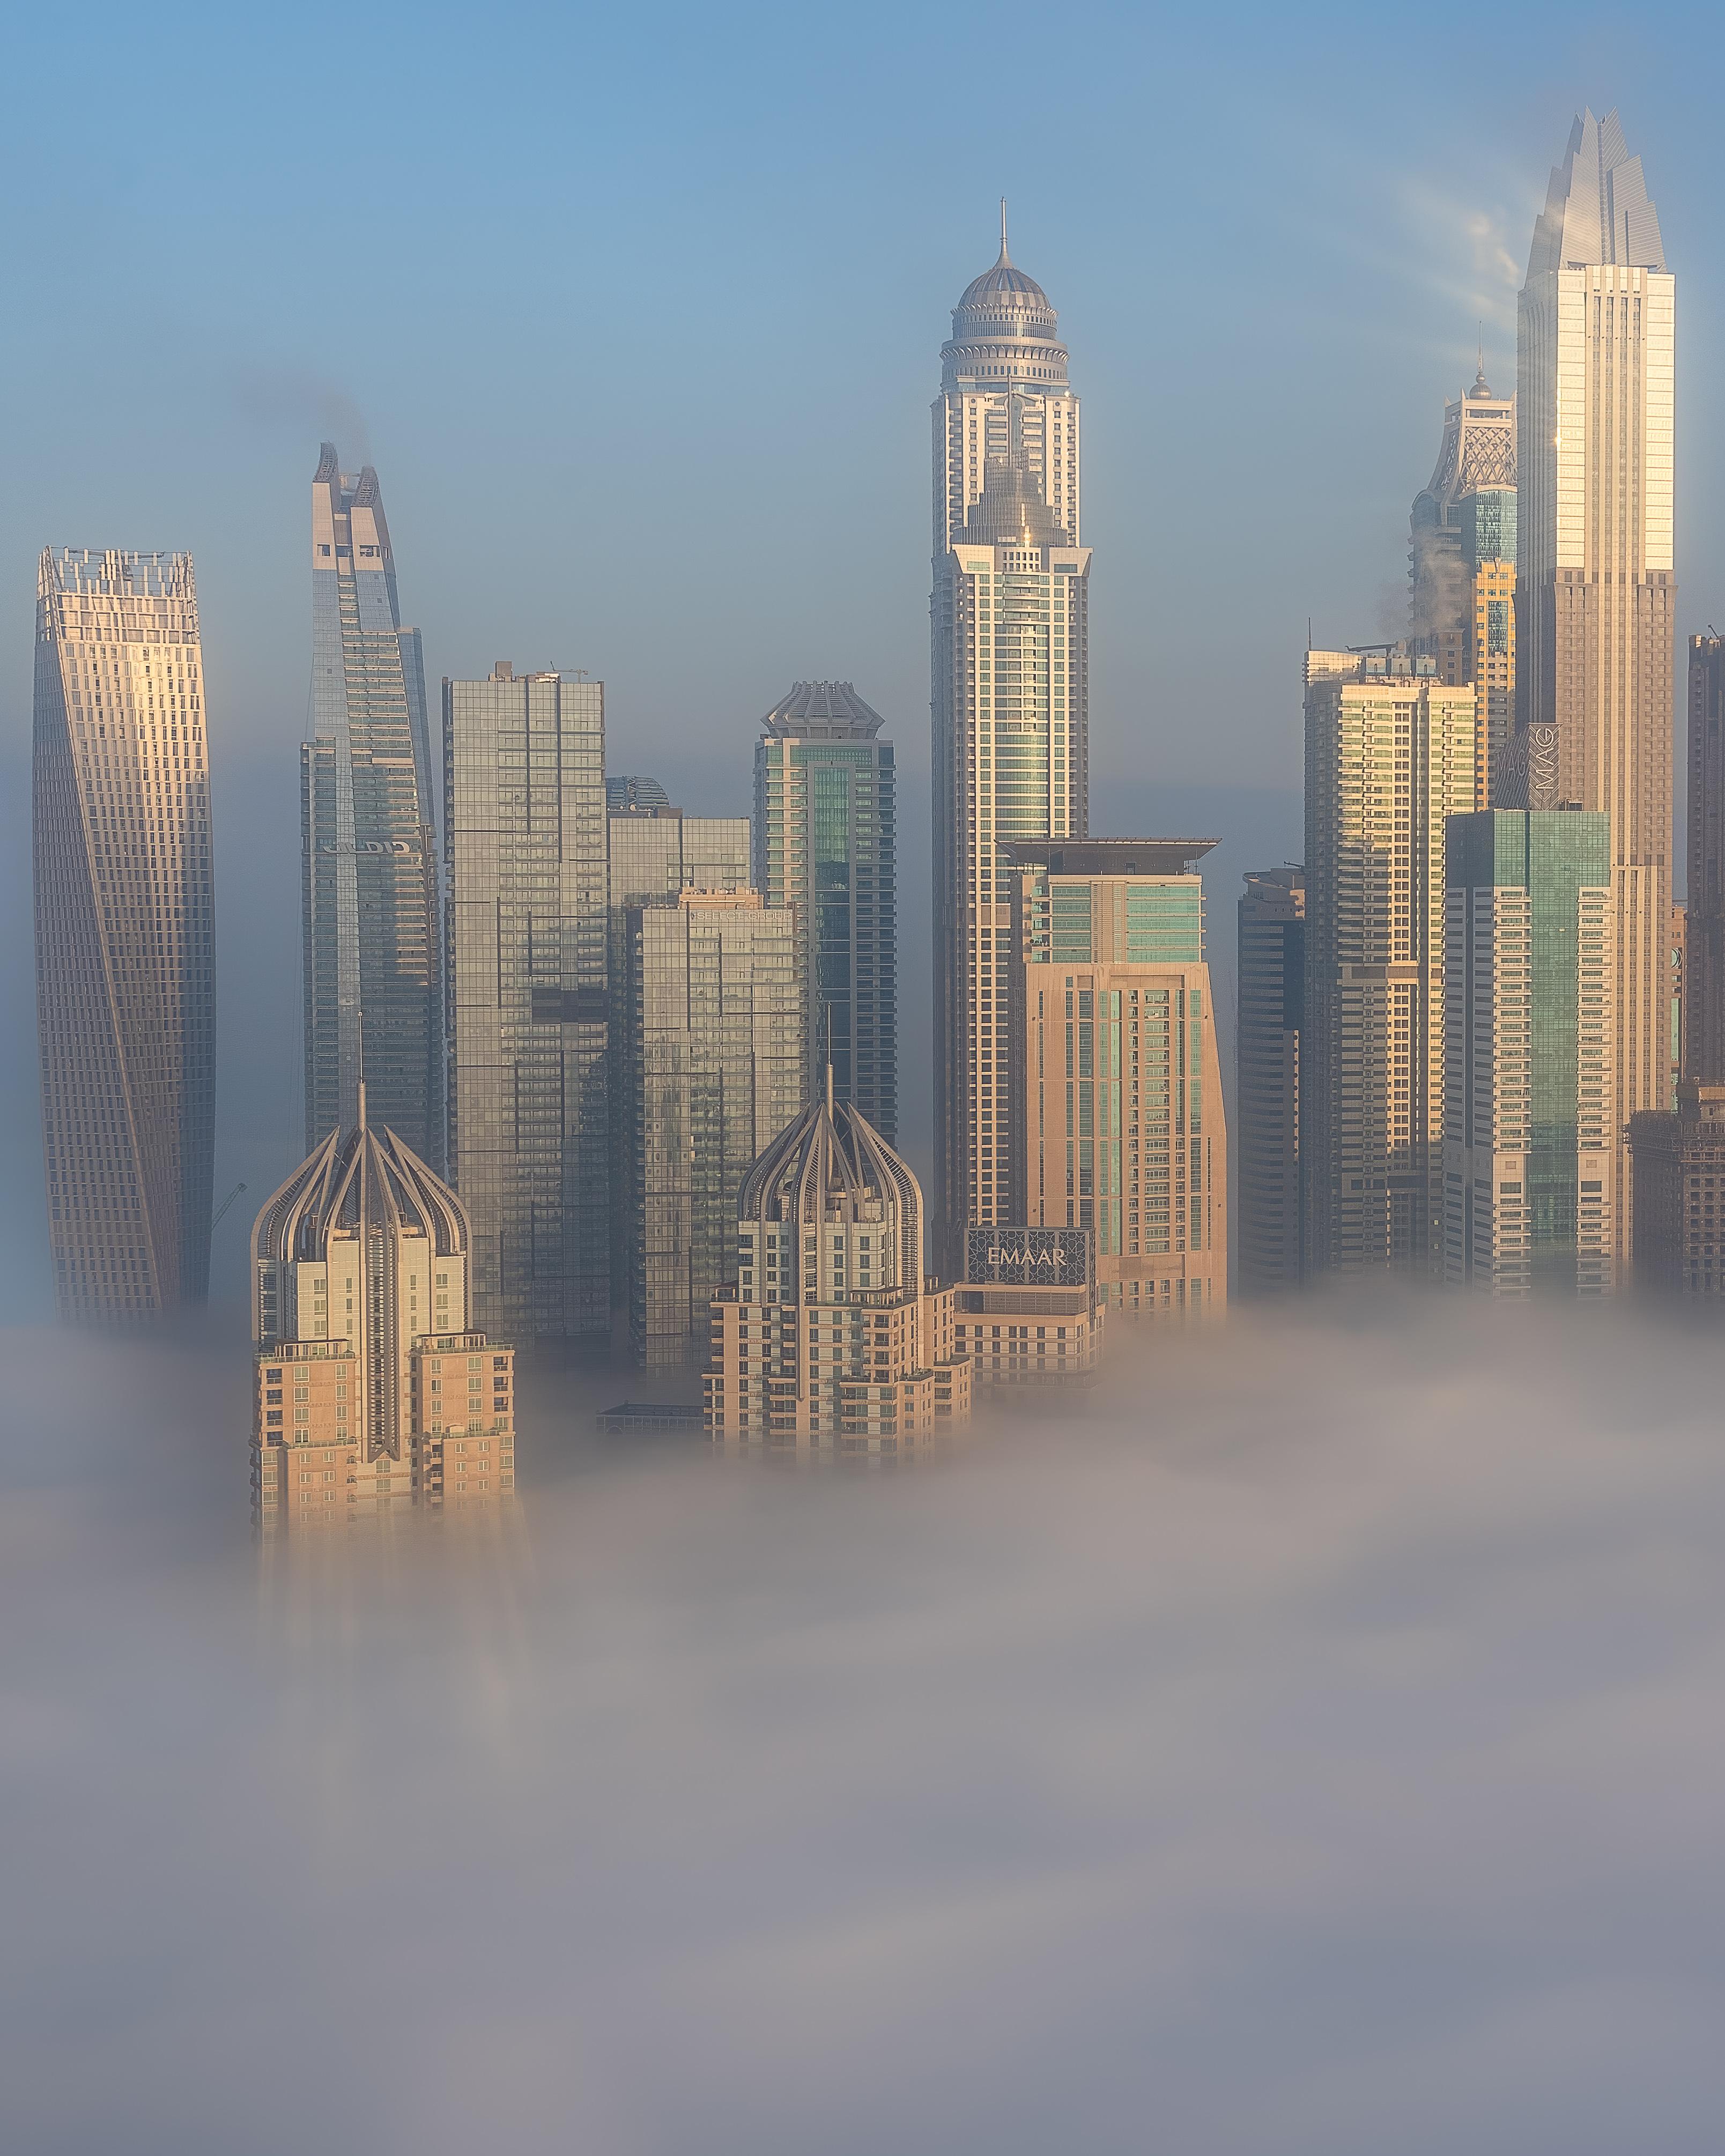 The Dubai Marina skyline rising up out of the fog.